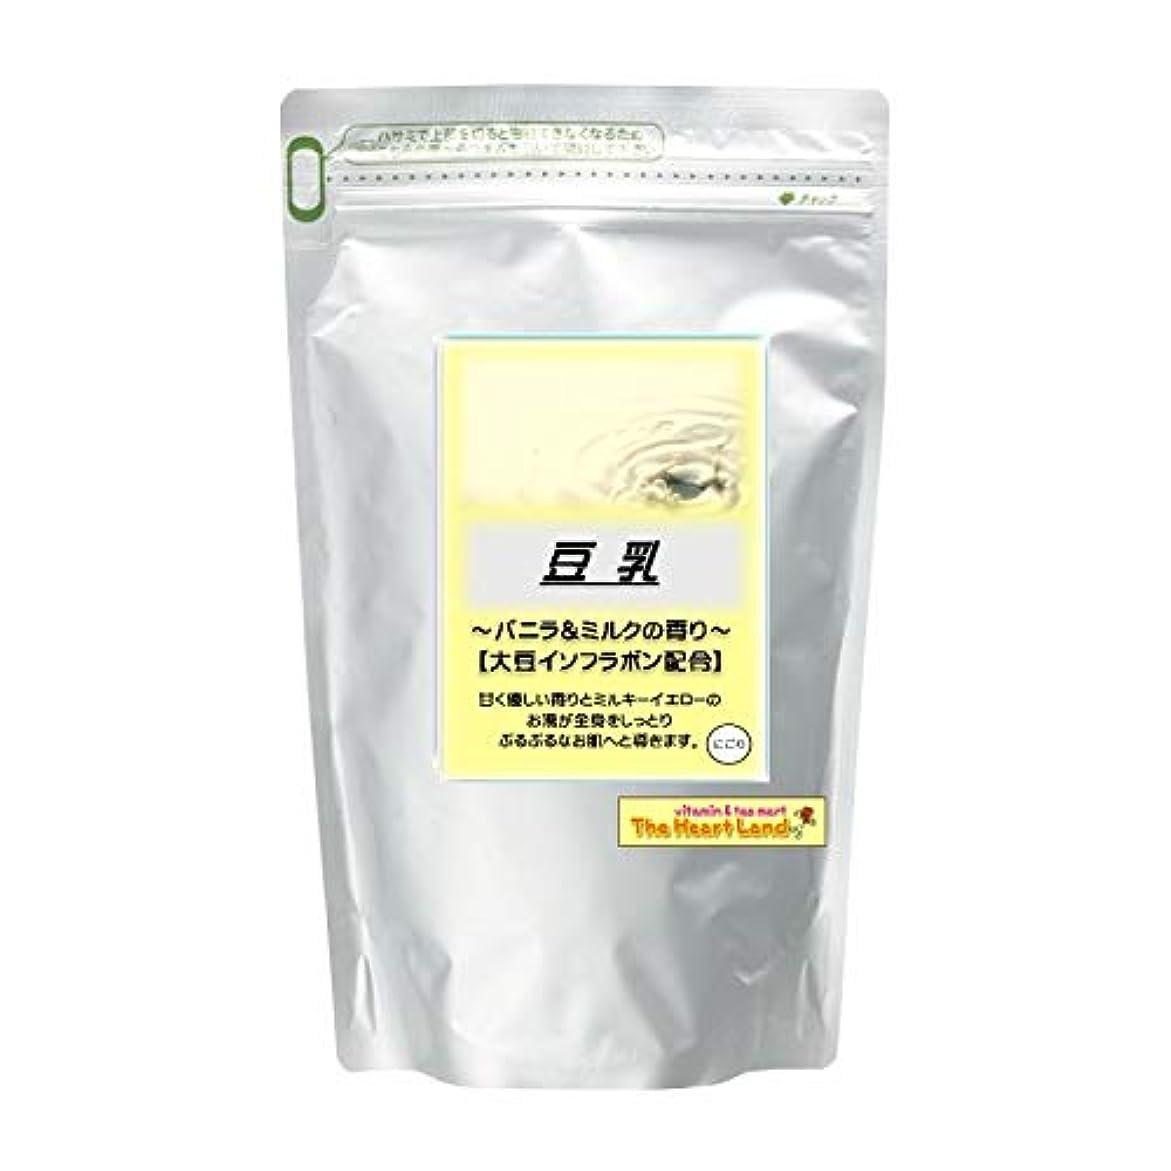 定期的ハーブ予感アサヒ入浴剤 浴用入浴化粧品 豆乳 2.5kg